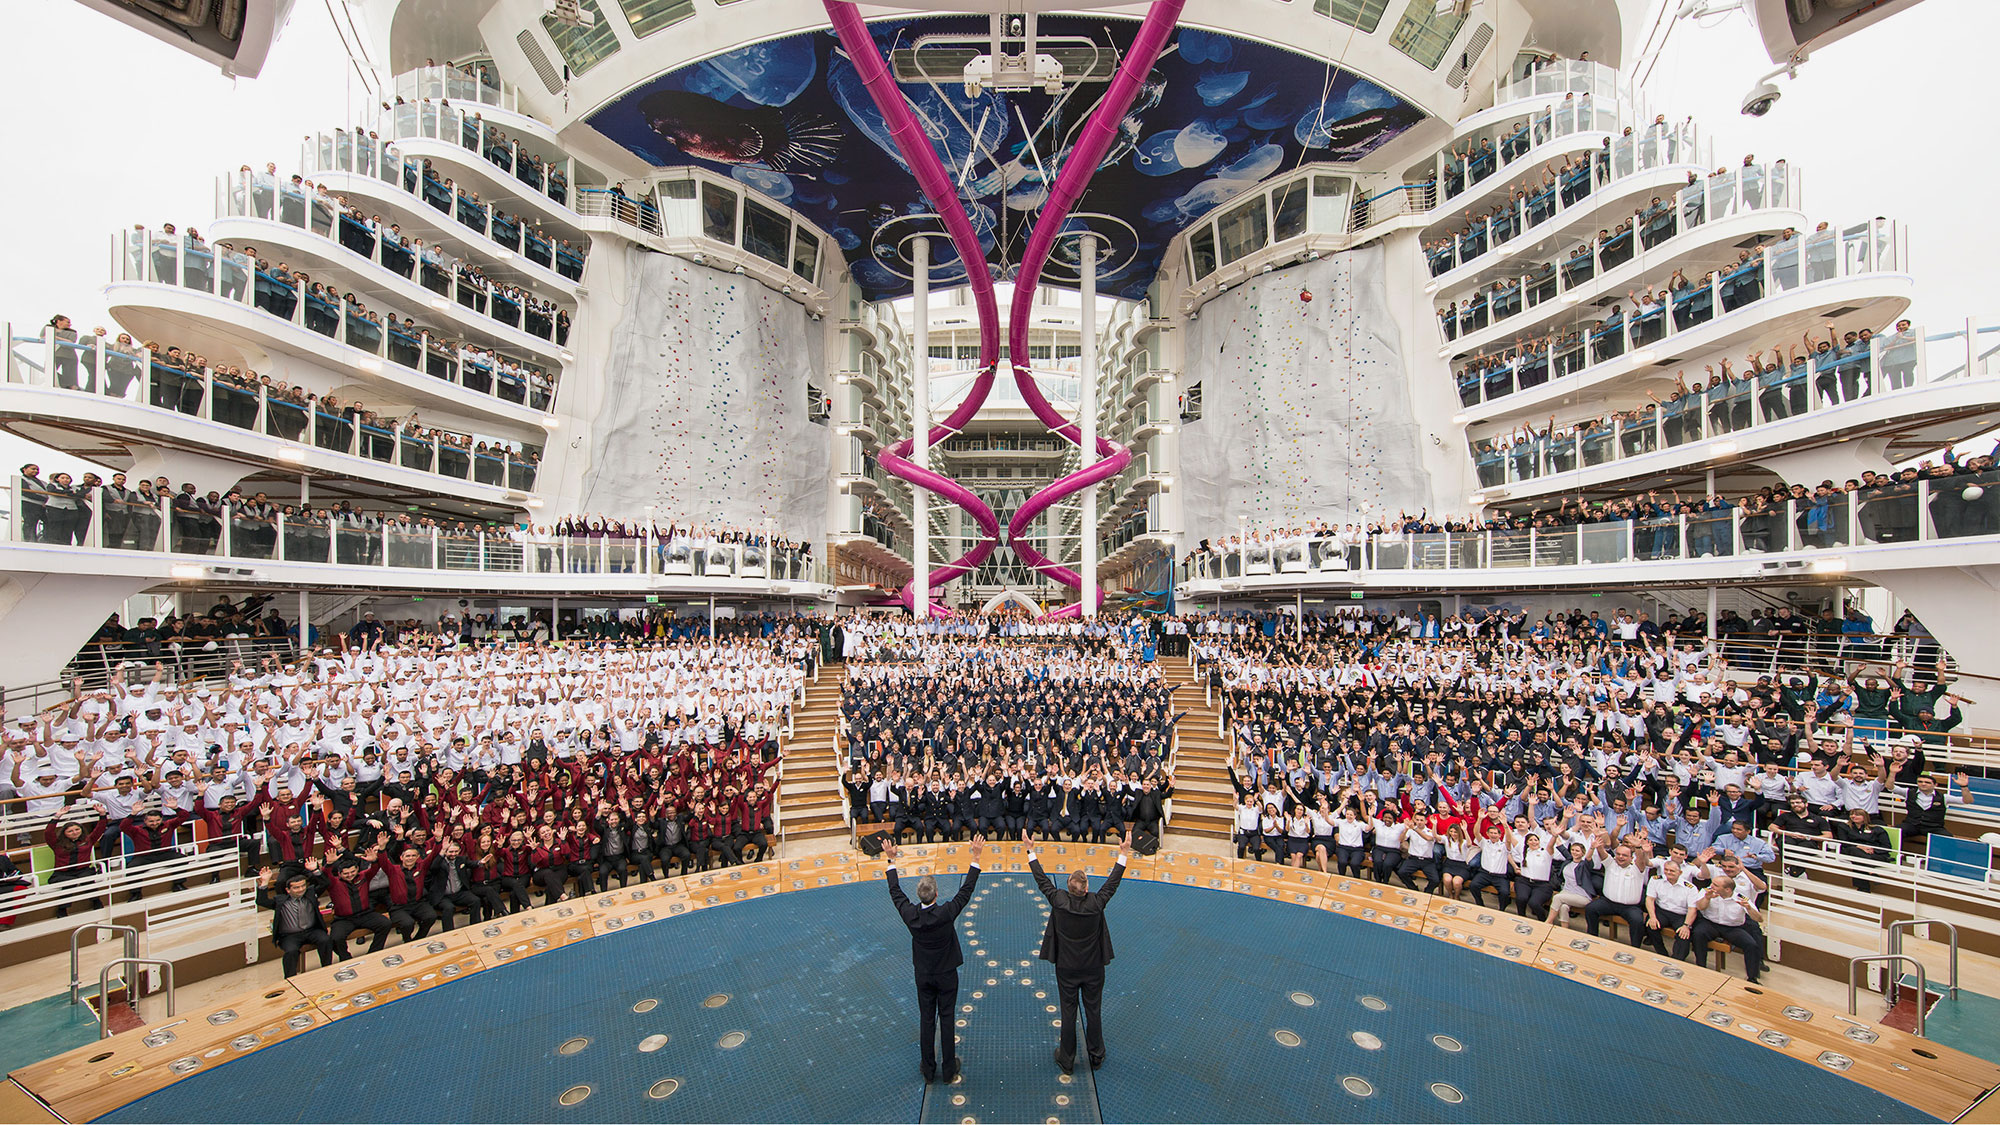 Harmony of the Seas joins Royal Caribbean's fleet: Travel Weekly